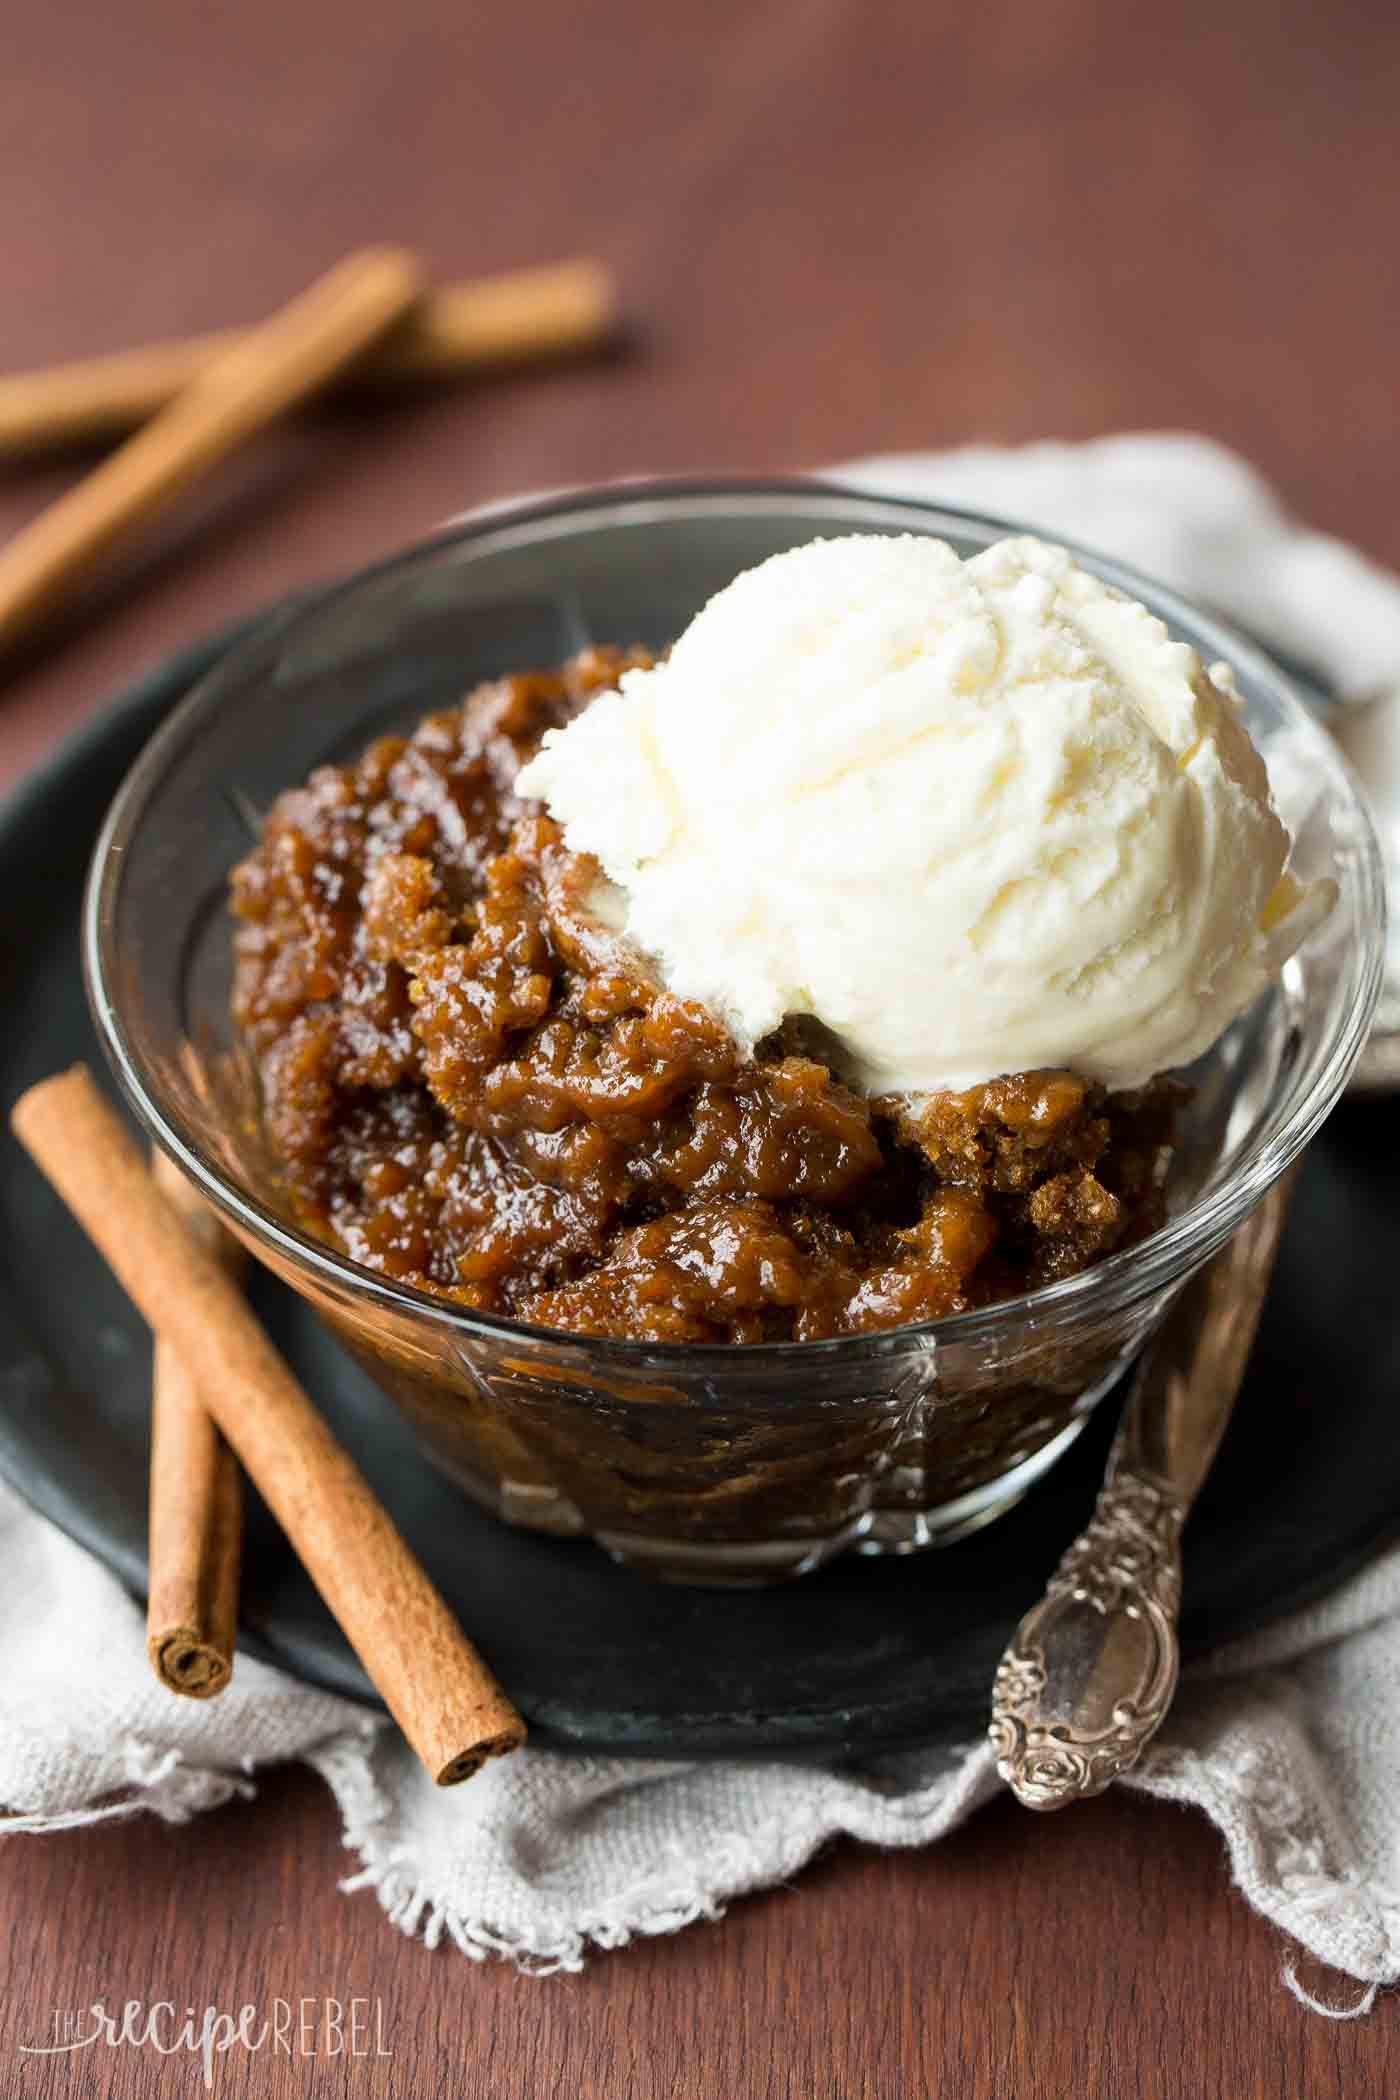 Slow Cooker Dessert Recipes  Gingerbread Pudding Cake a Slow Cooker Dessert